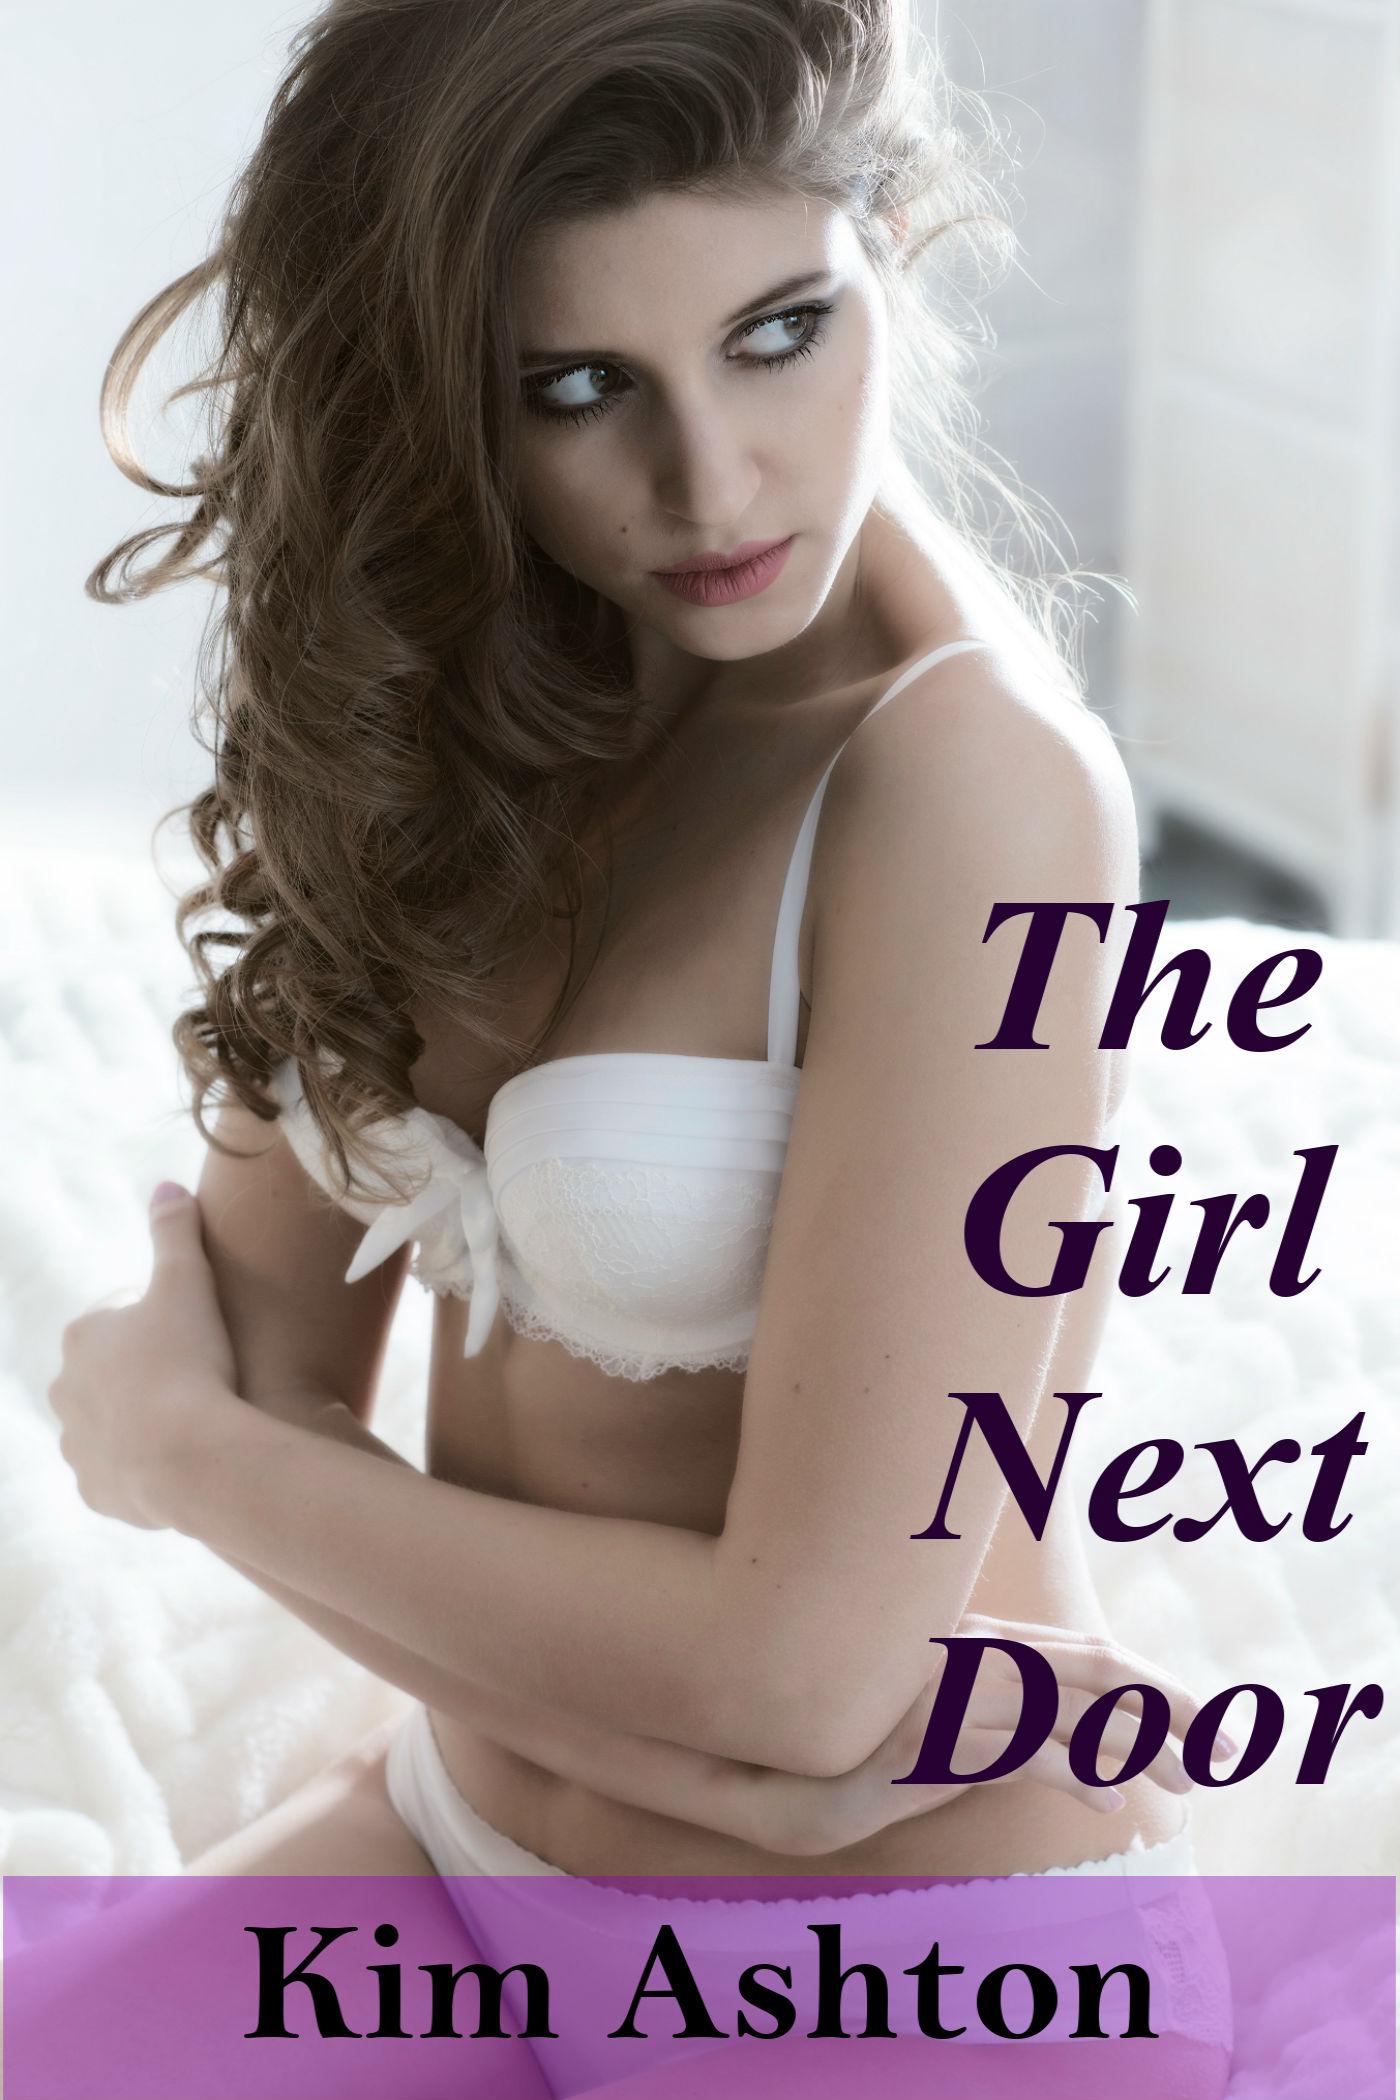 Kim Ashton - The Girl Next Door (BDSM Erotic Romance, Shy Submissive)